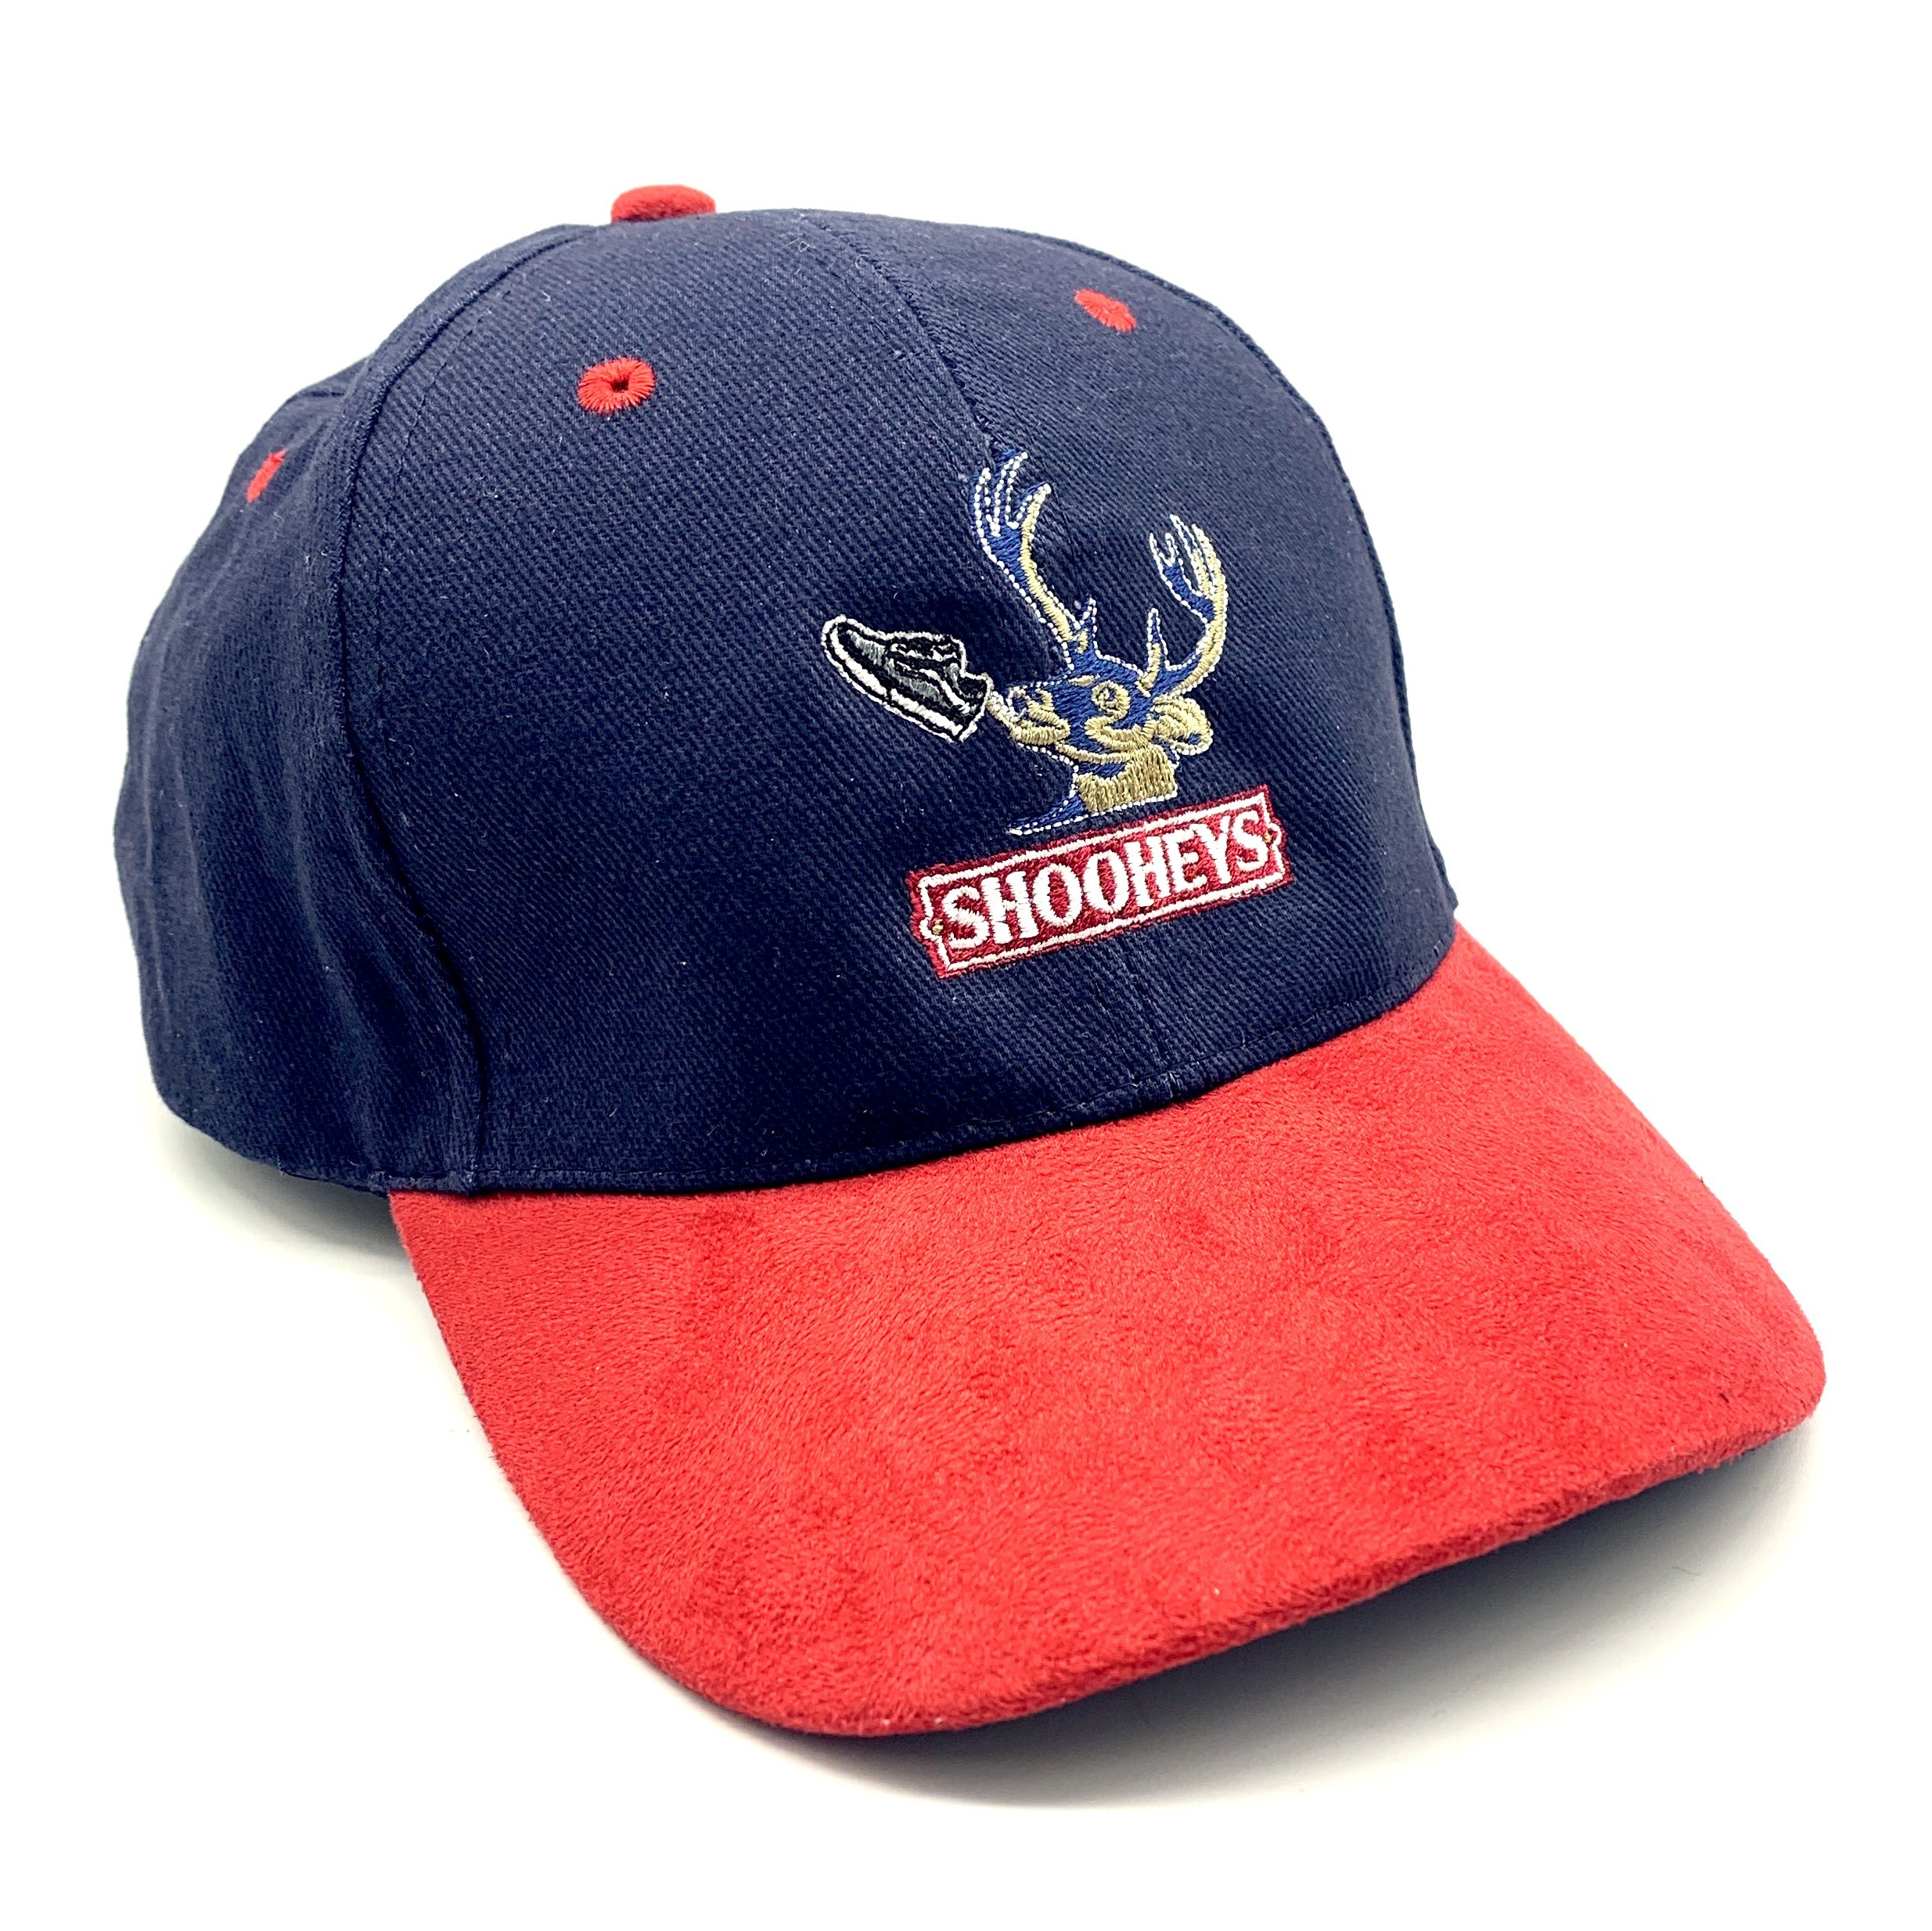 SHOOHEYS RED/NAVY DAD HAT